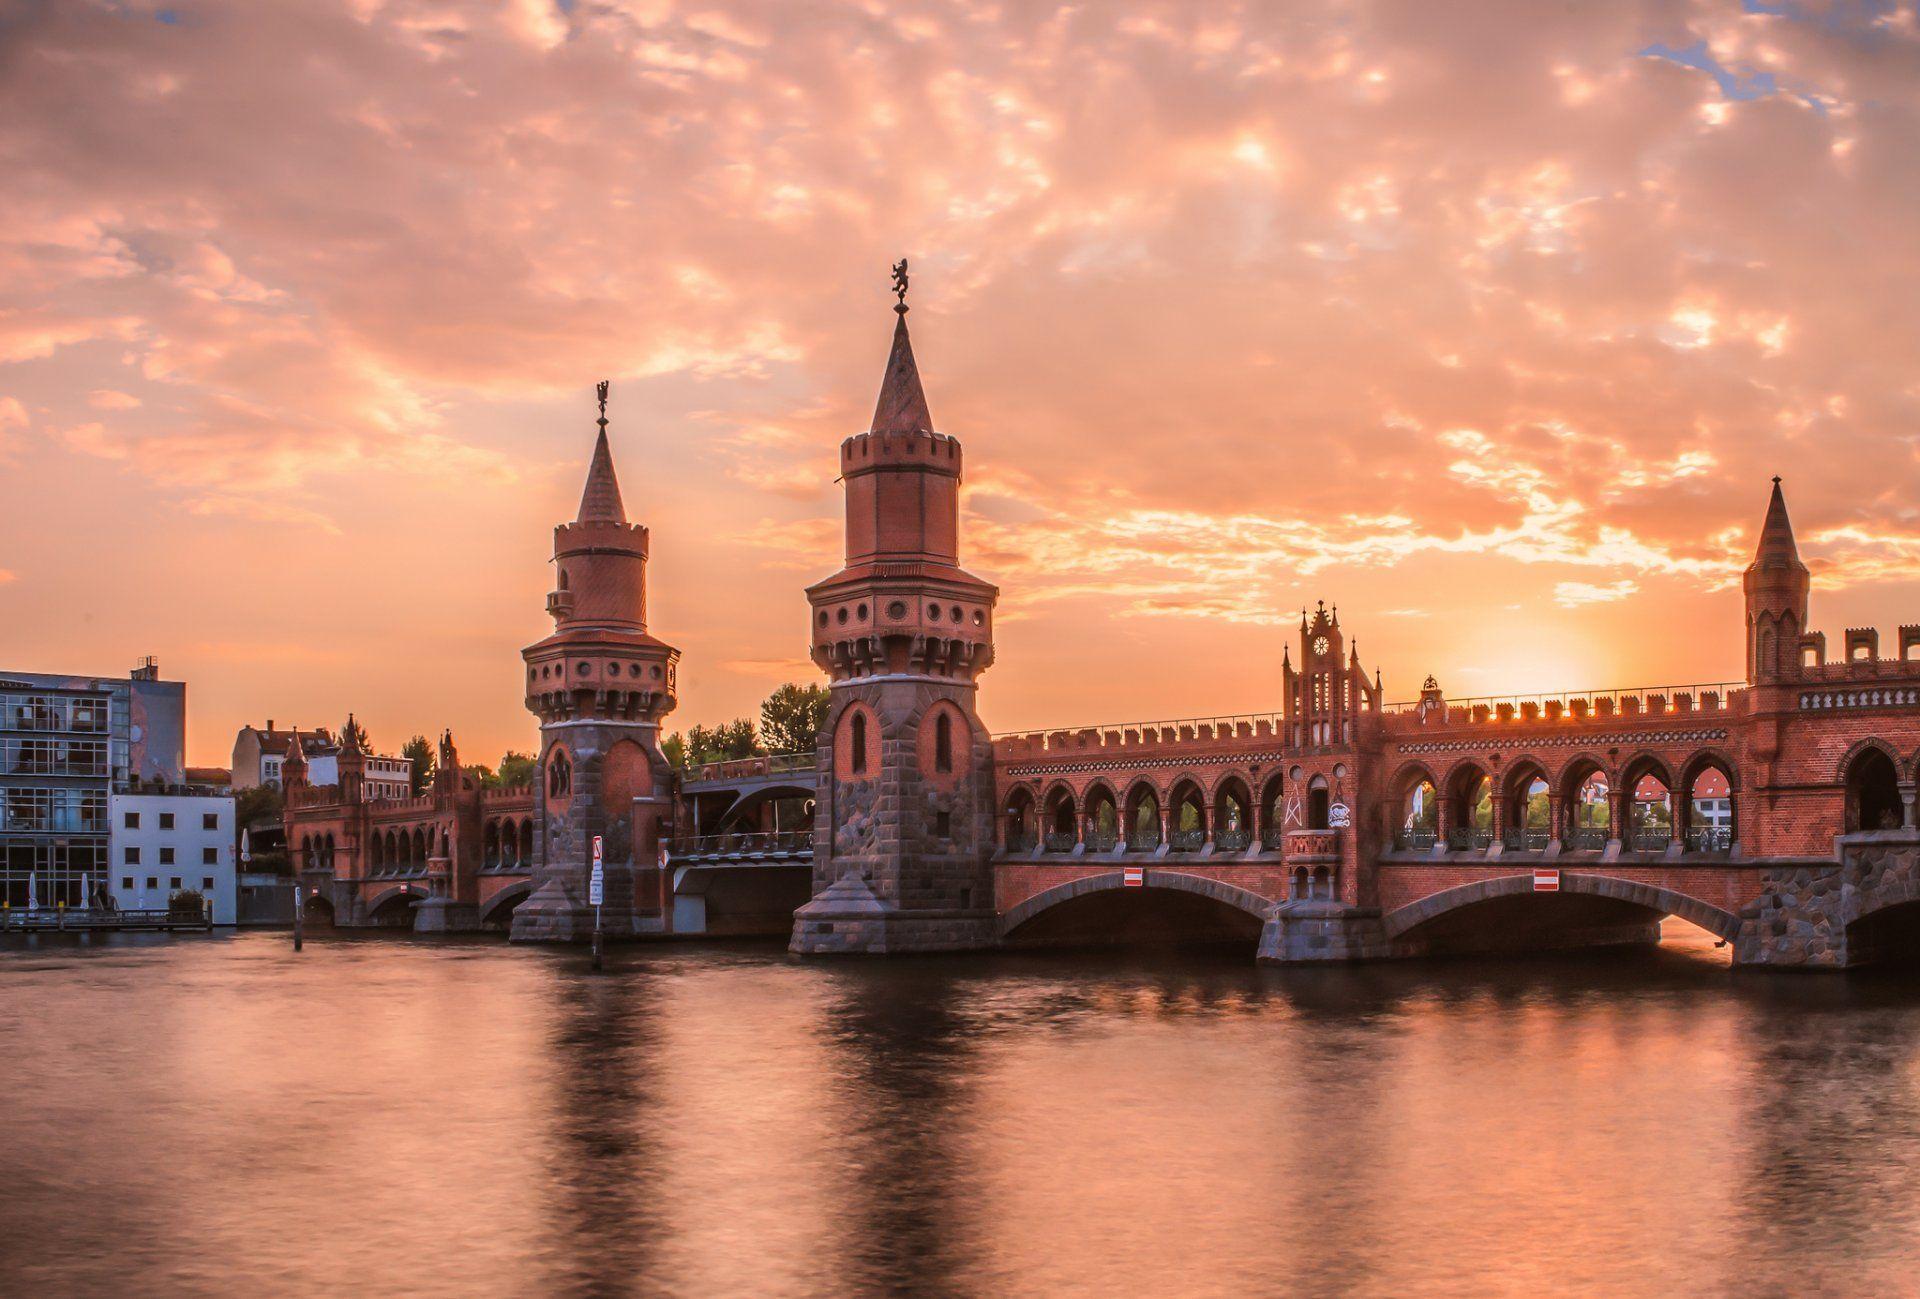 Berlin Oberbaumbrucke River Bridge Night Sunset Hd Wallpaper